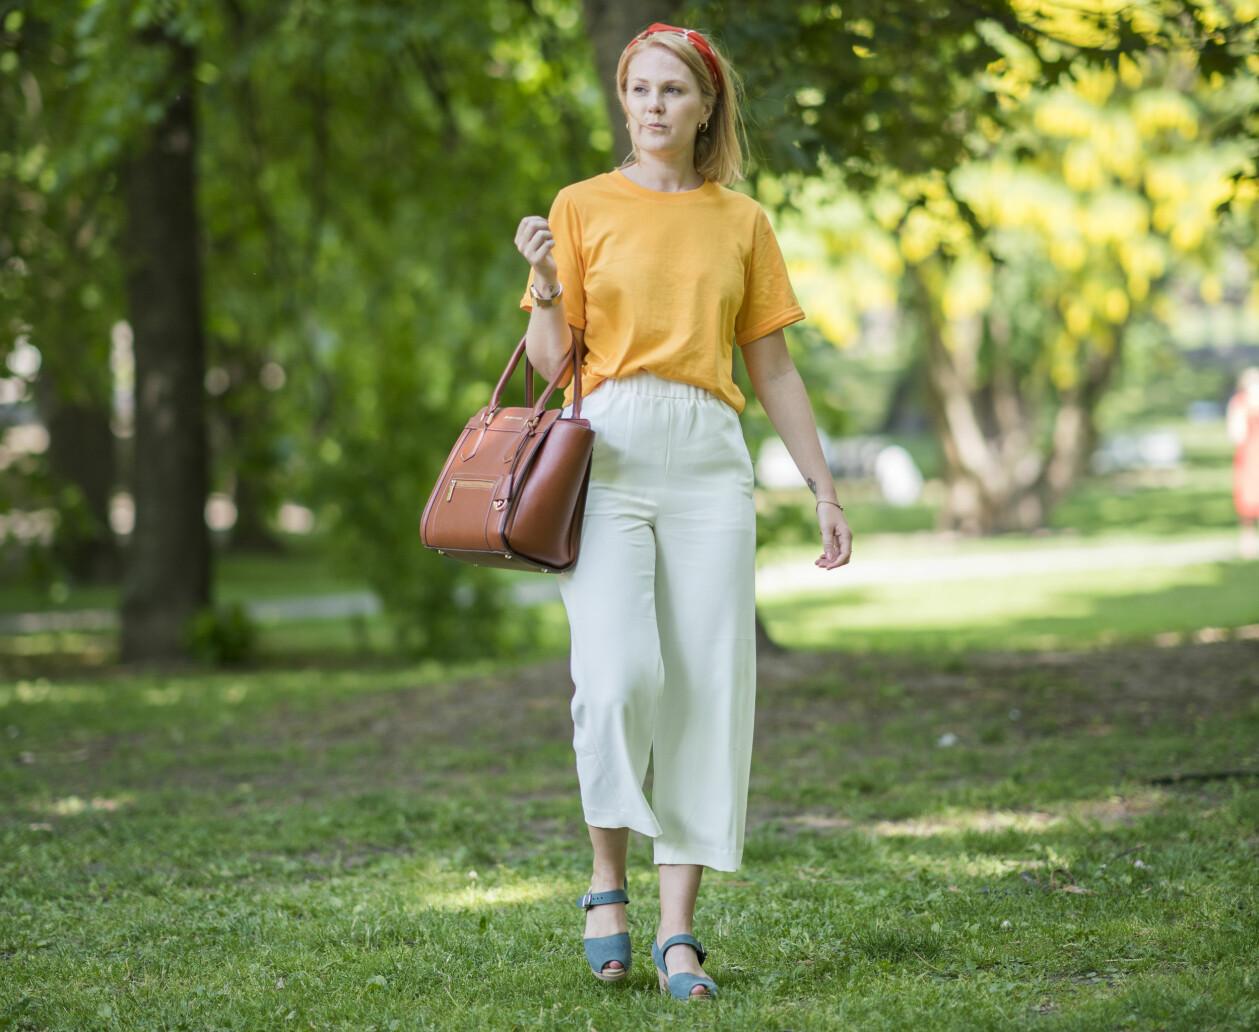 Mia Rosengren som levde i en destruktiv relation vandrar i en park.